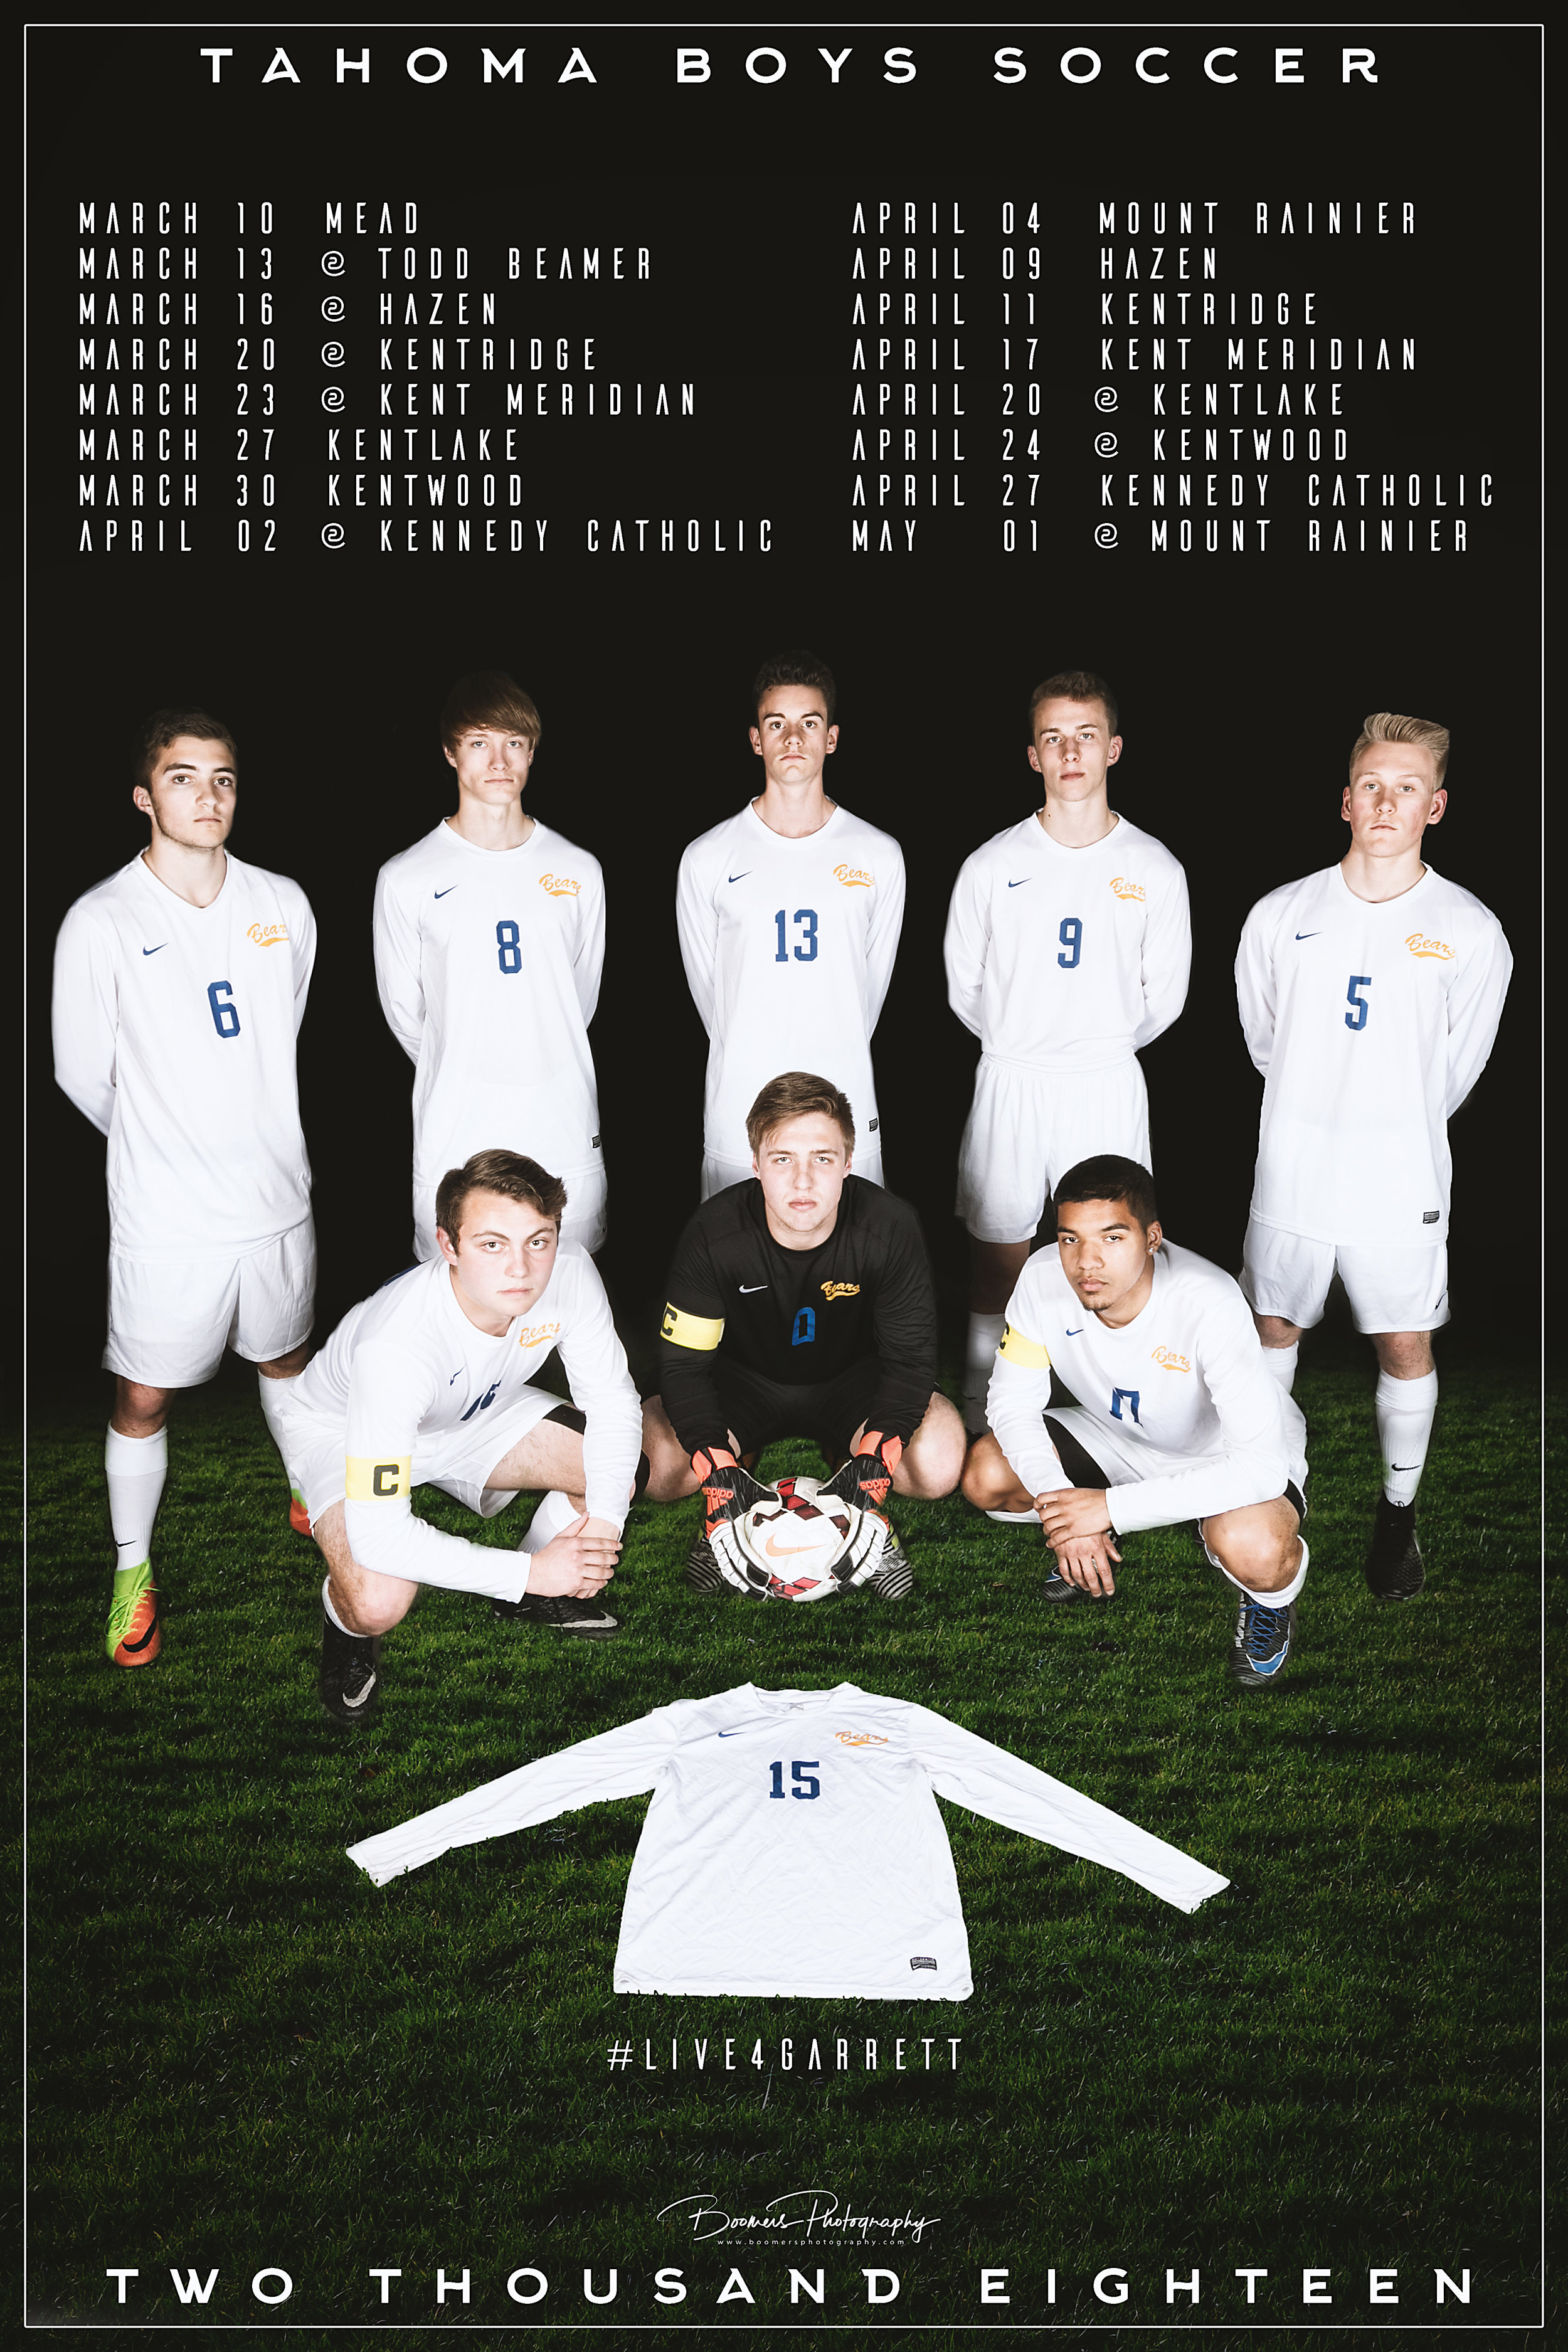 18 Boys Soc Poster.jpg